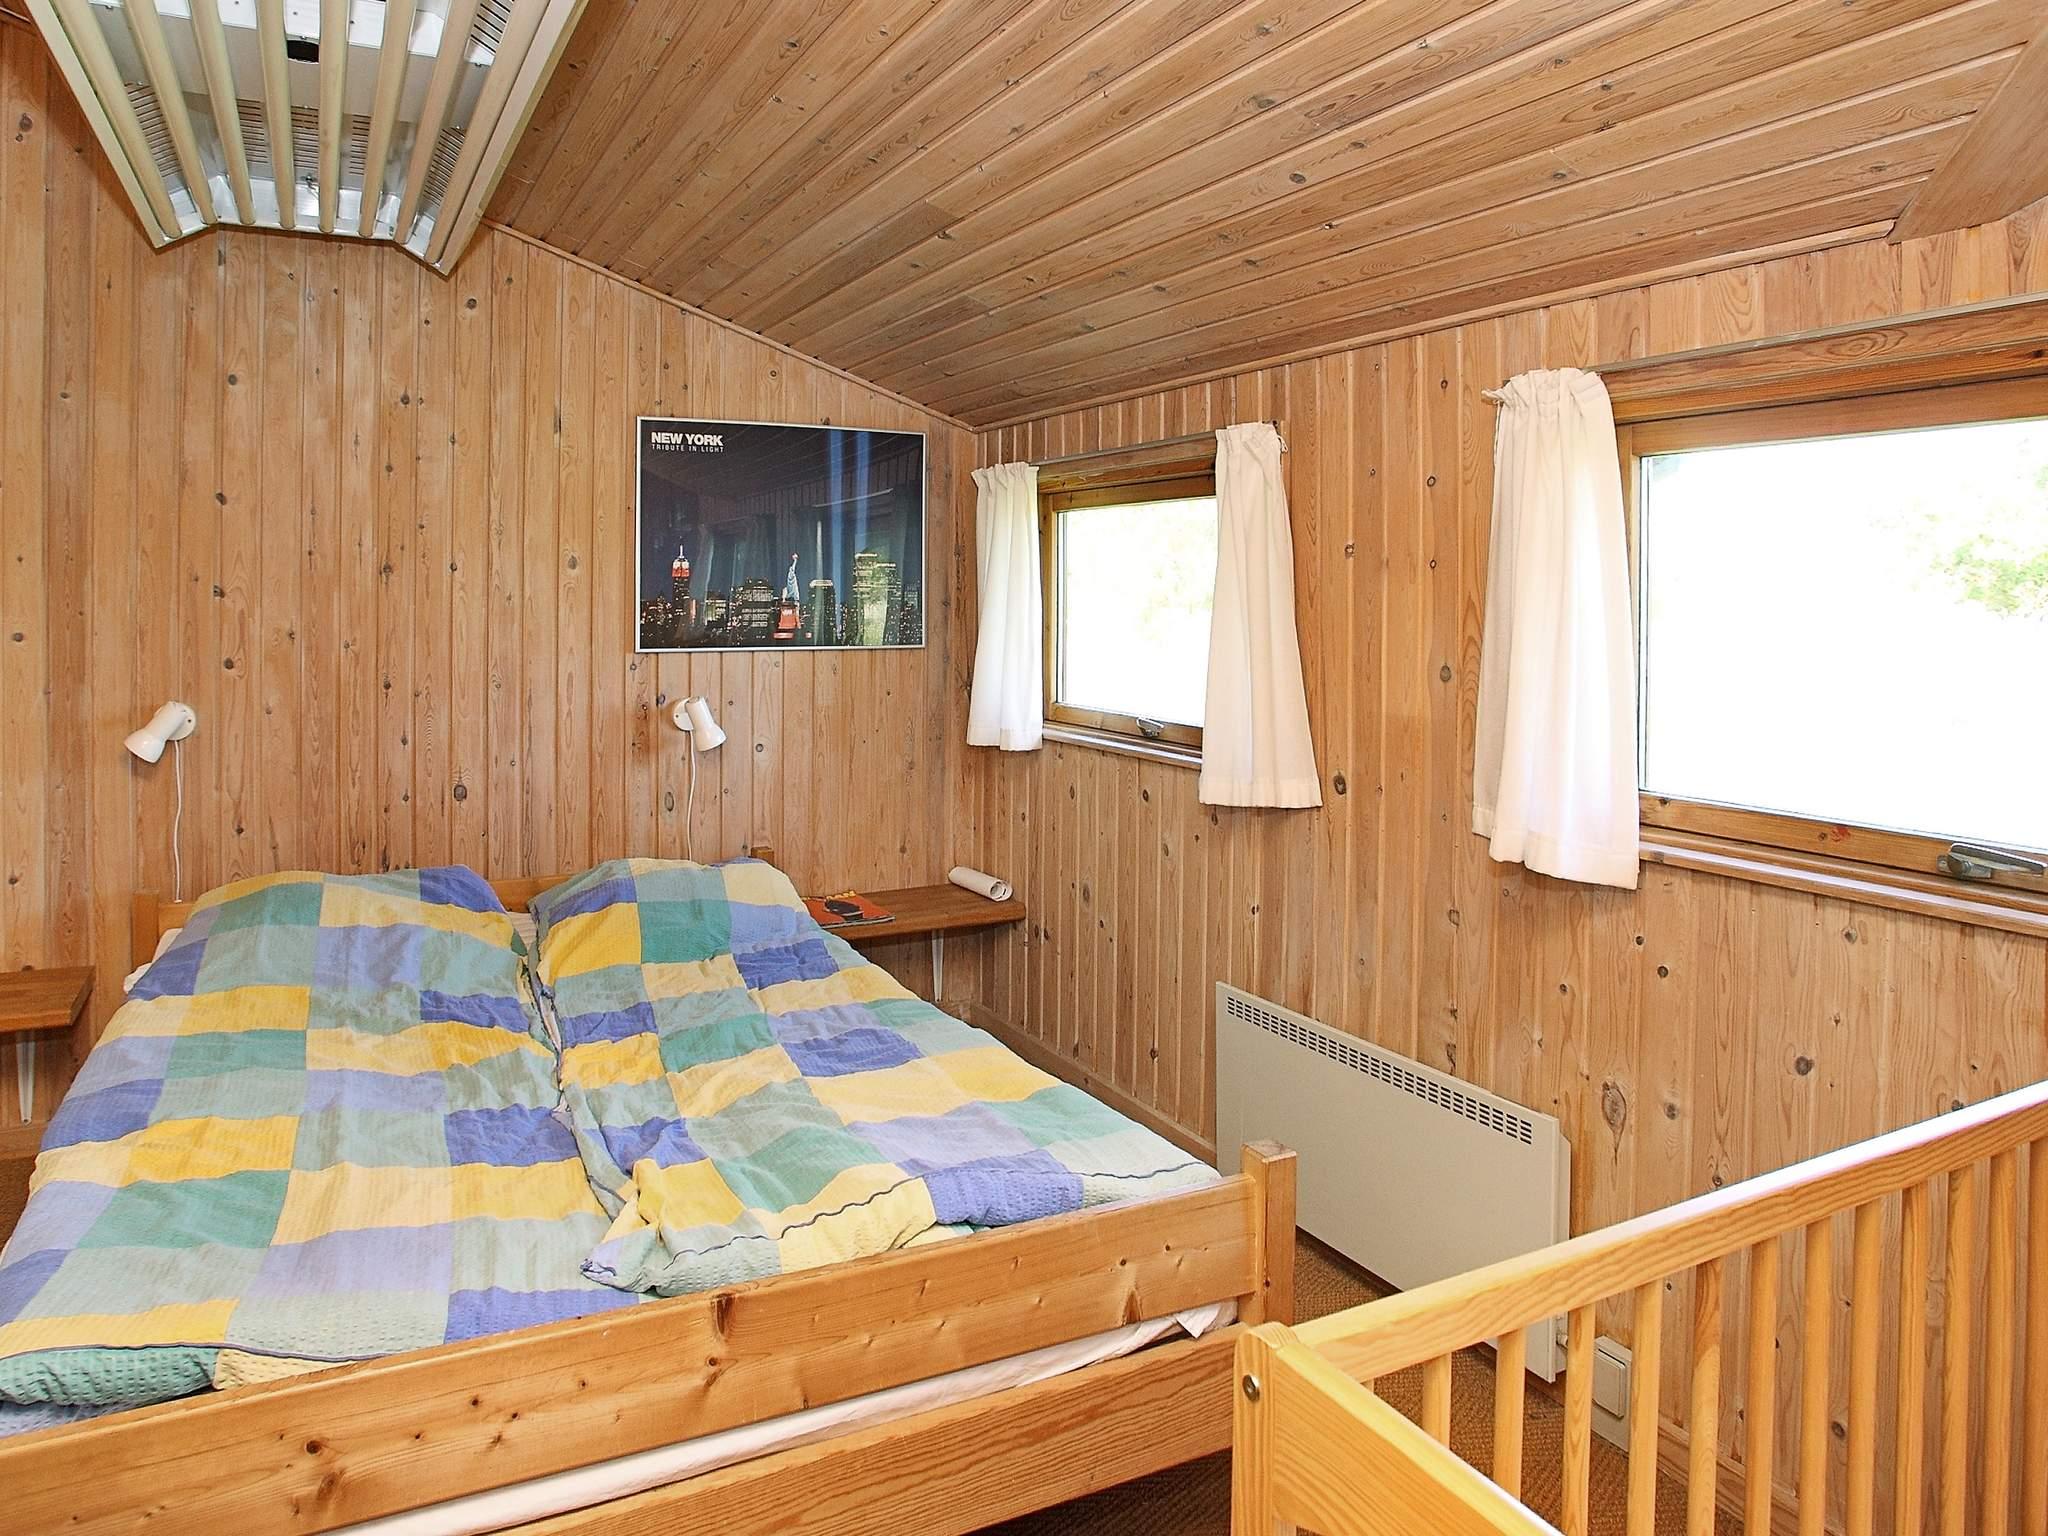 Ferienhaus Kjul Strand (319409), Hirtshals, , Dänische Nordsee, Dänemark, Bild 10